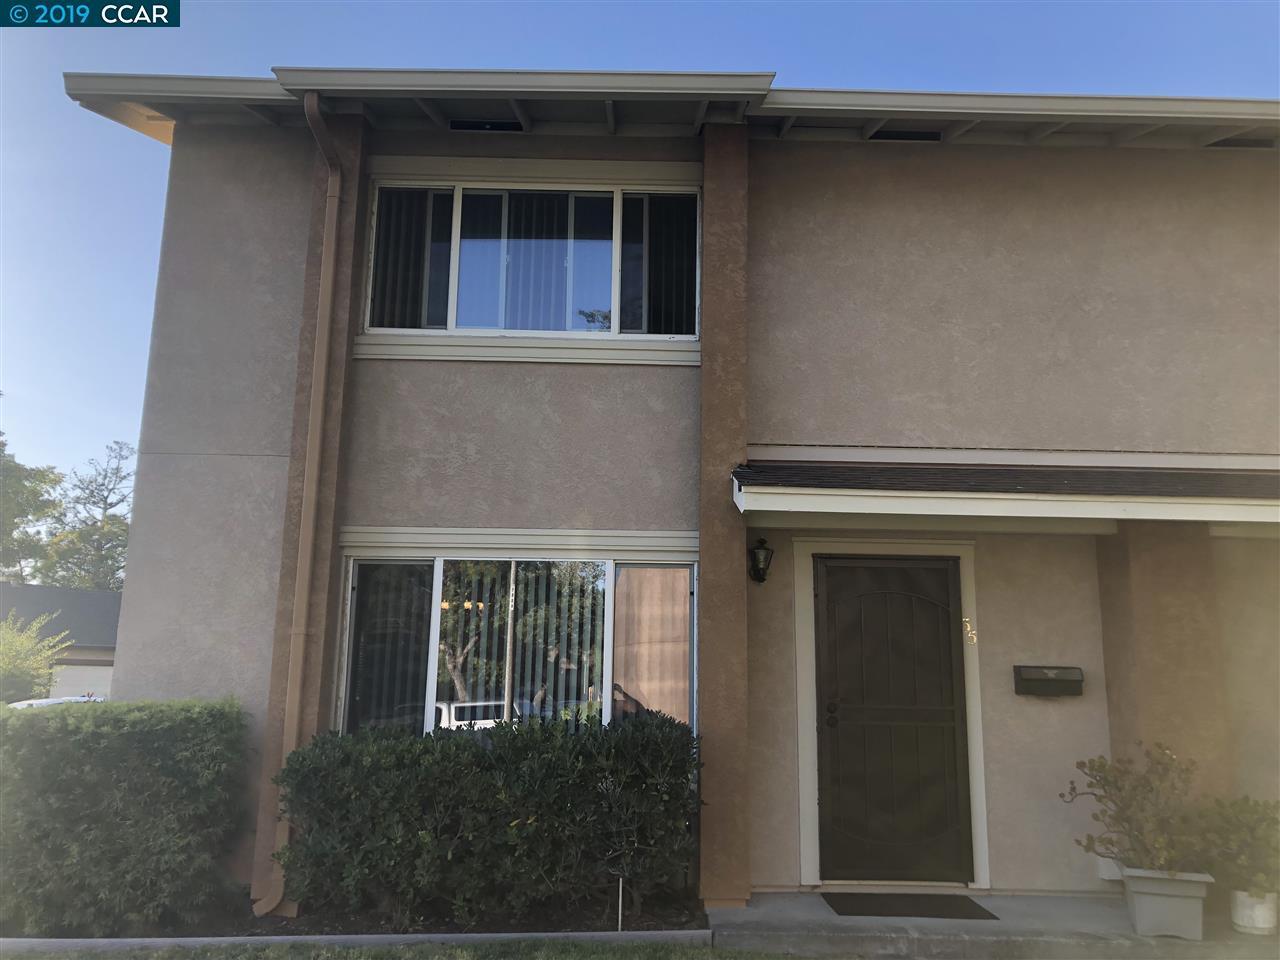 35 OVERLOOK LN, RICHMOND, CA 94803